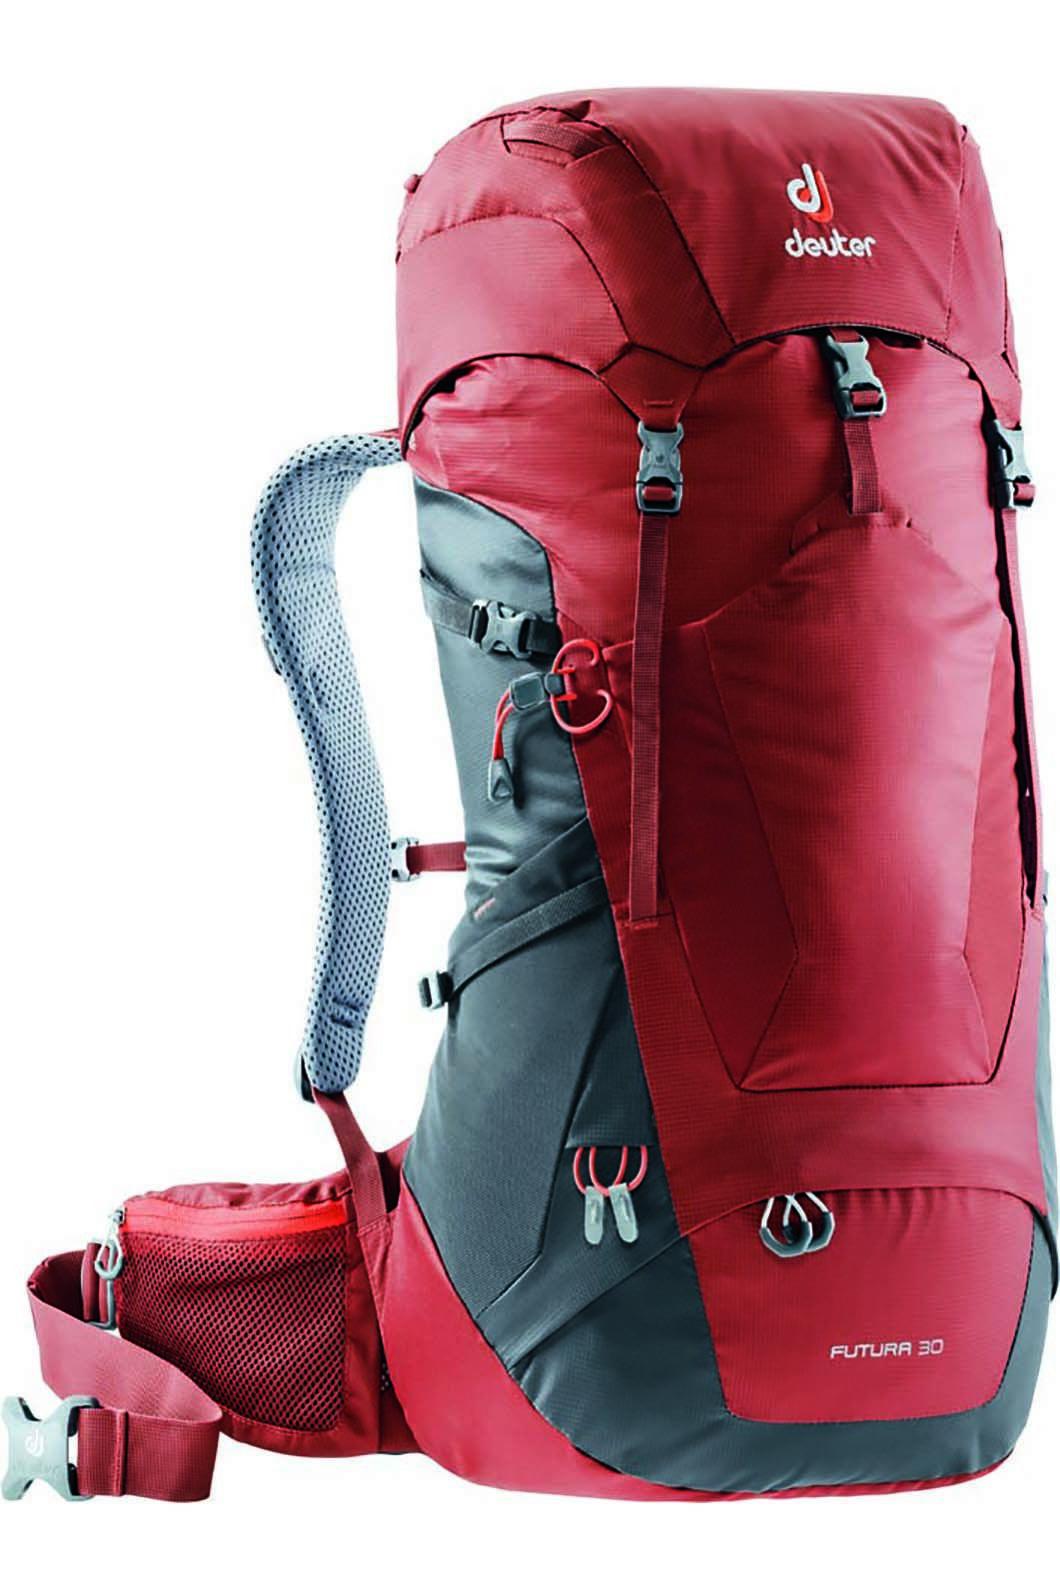 Deuter Futura Trekking Pack 30L, None, hi-res